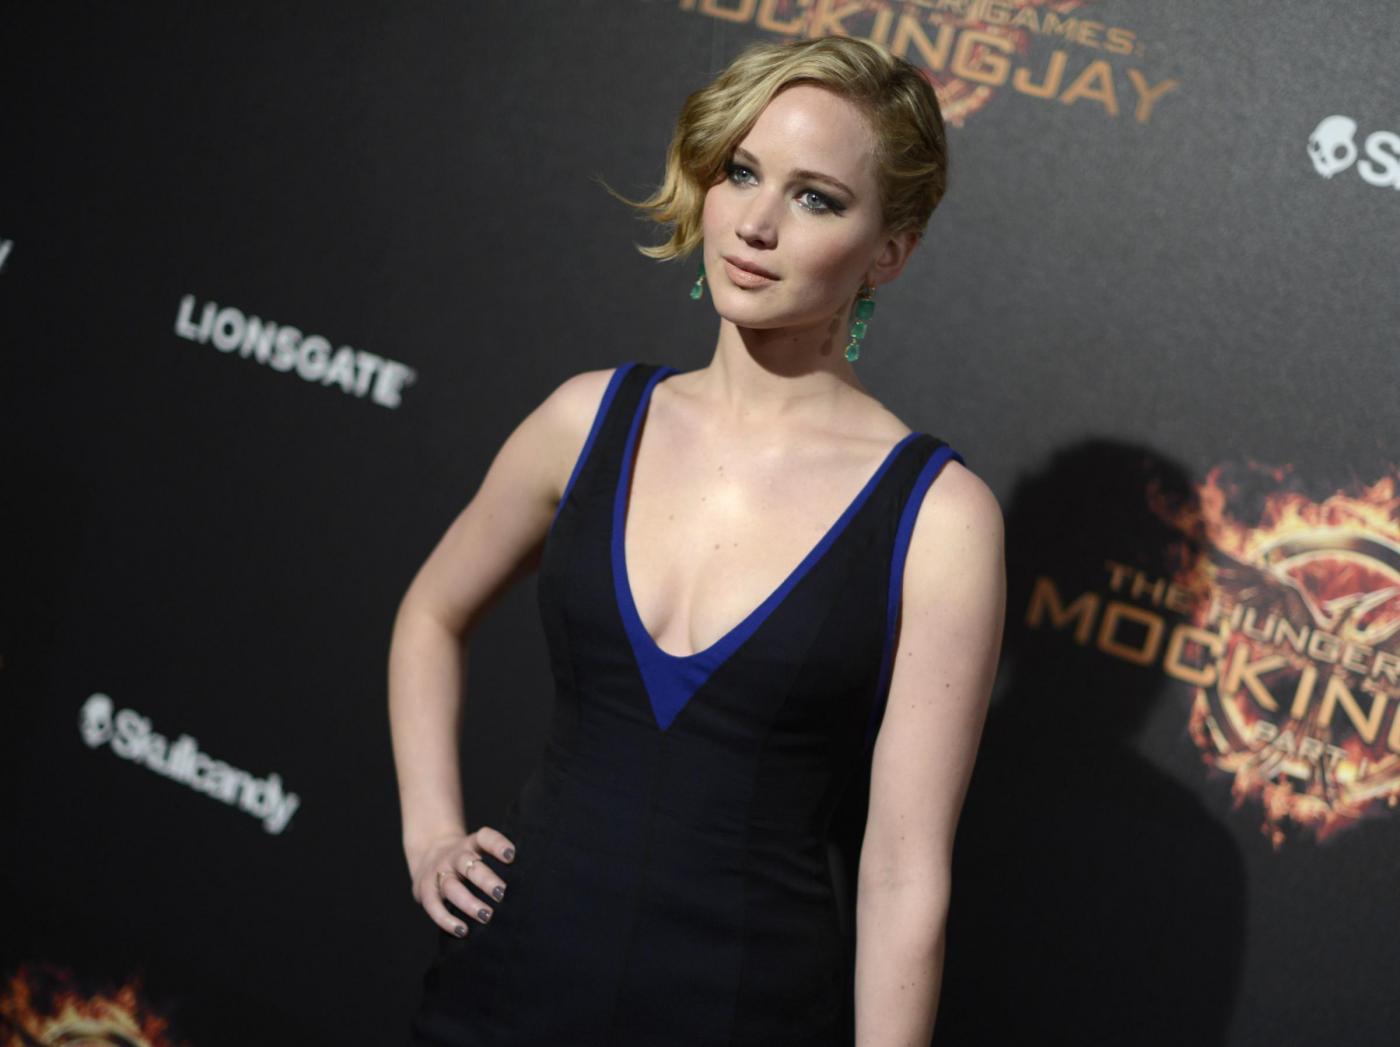 Jennifer Lawrence: galleria d'arte esporrà le sue foto piratate